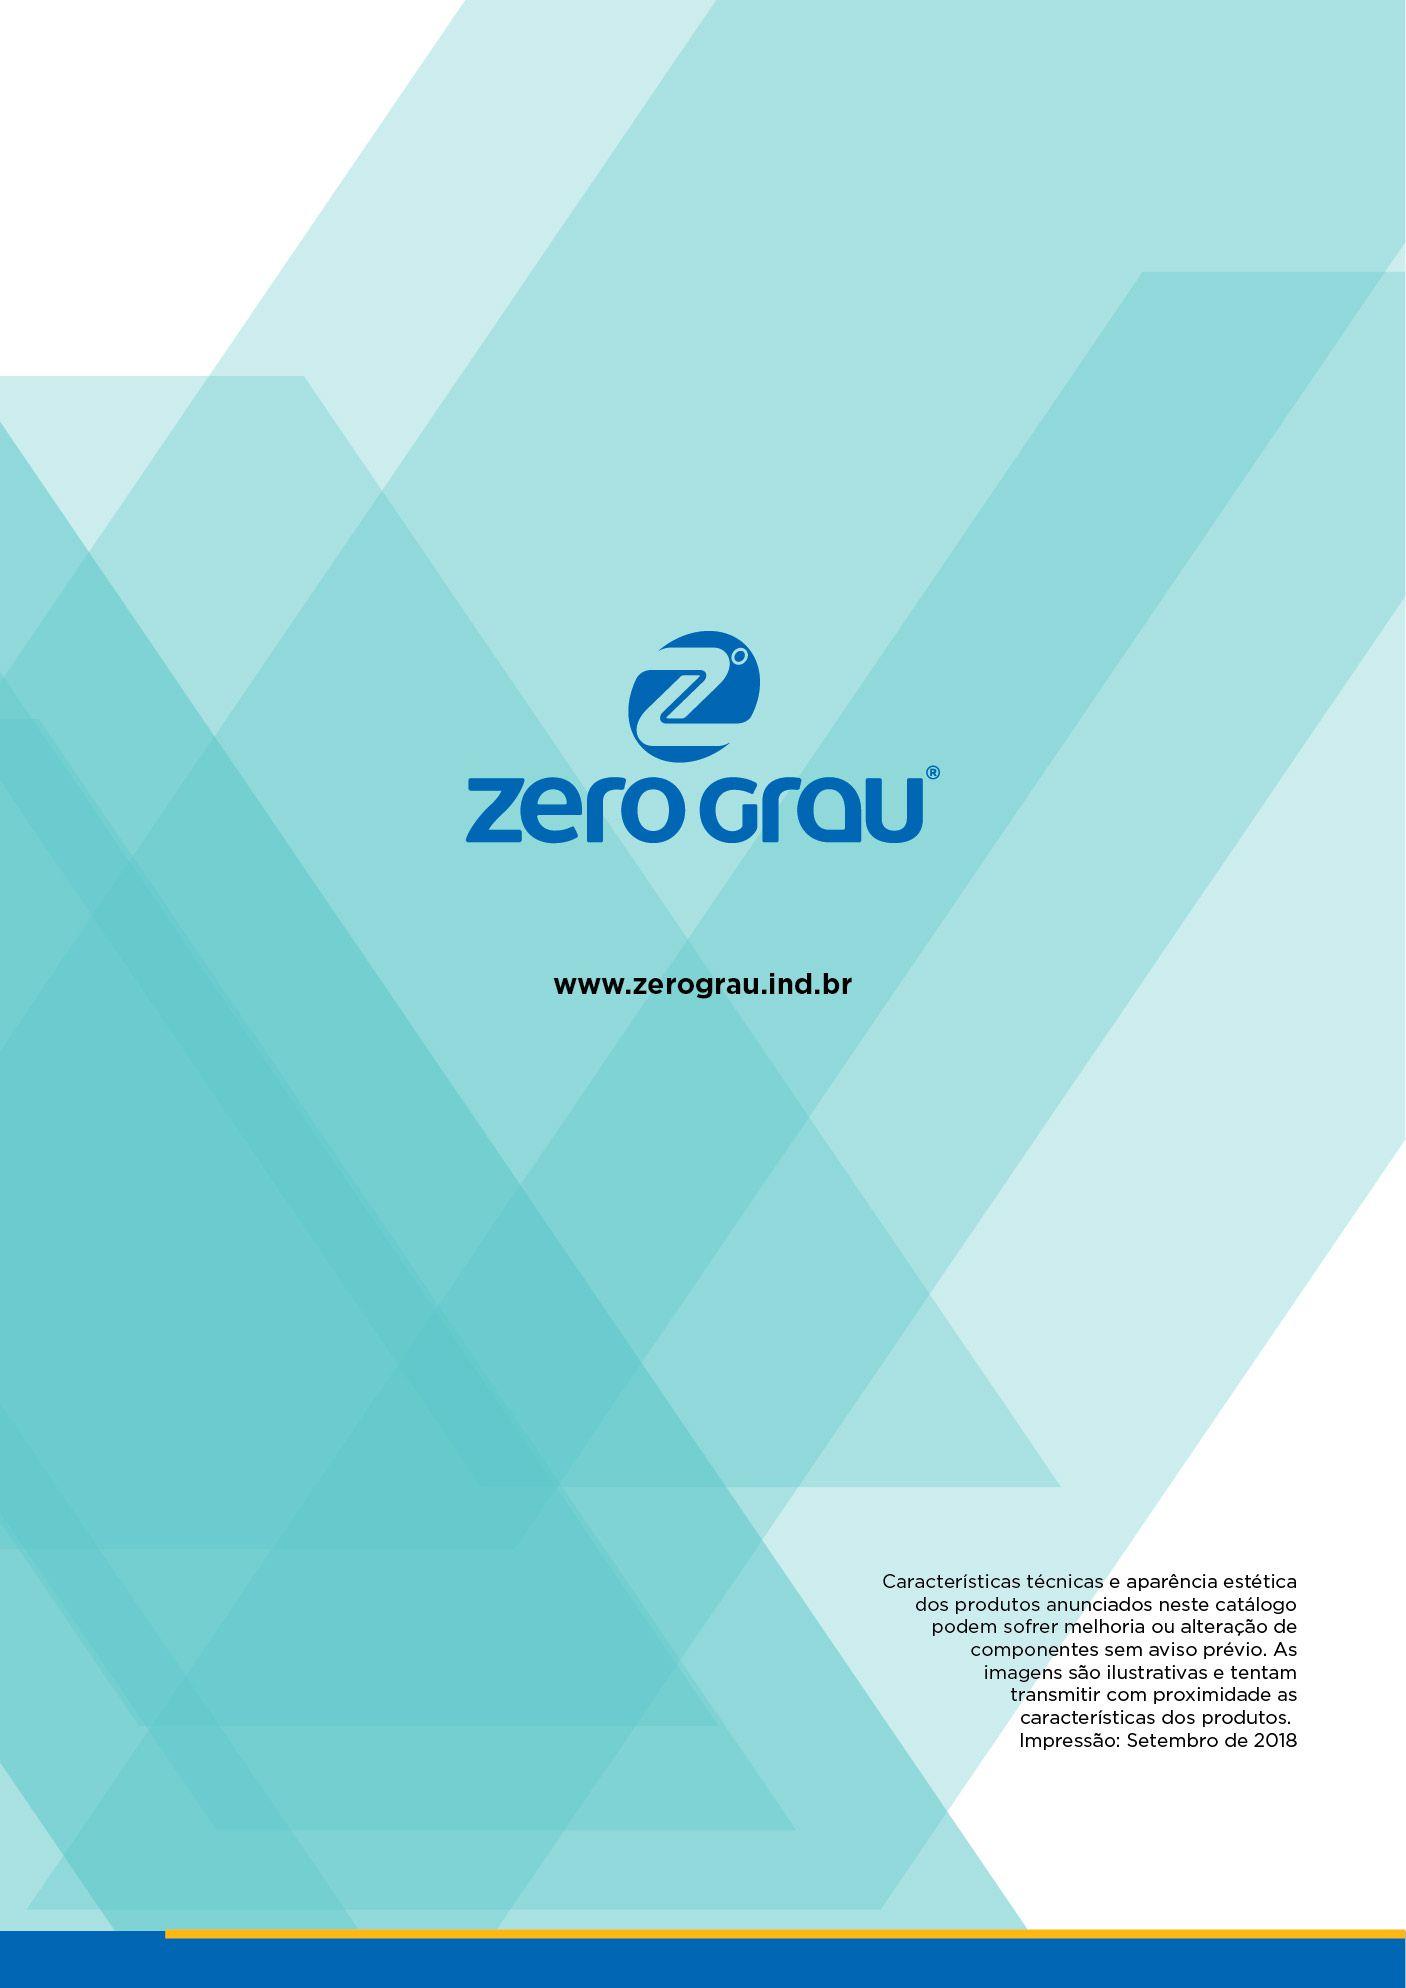 03- Mini de 50 cxs bebidas + FRETE  - Zero Grau Store